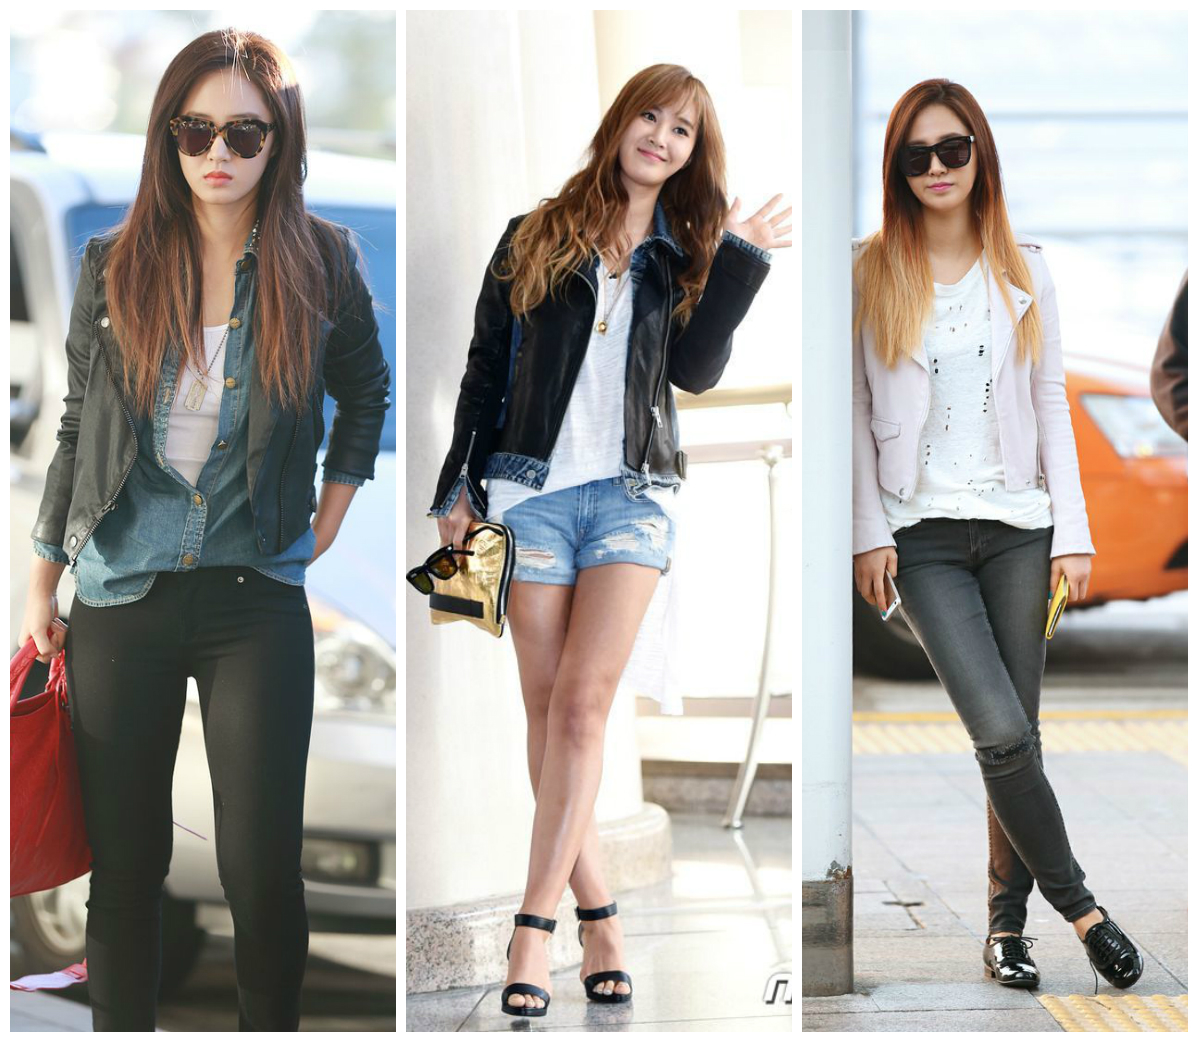 Favorite Airport Fashion - SNSD edition - Merzy's Corner  Favorite Airpor...